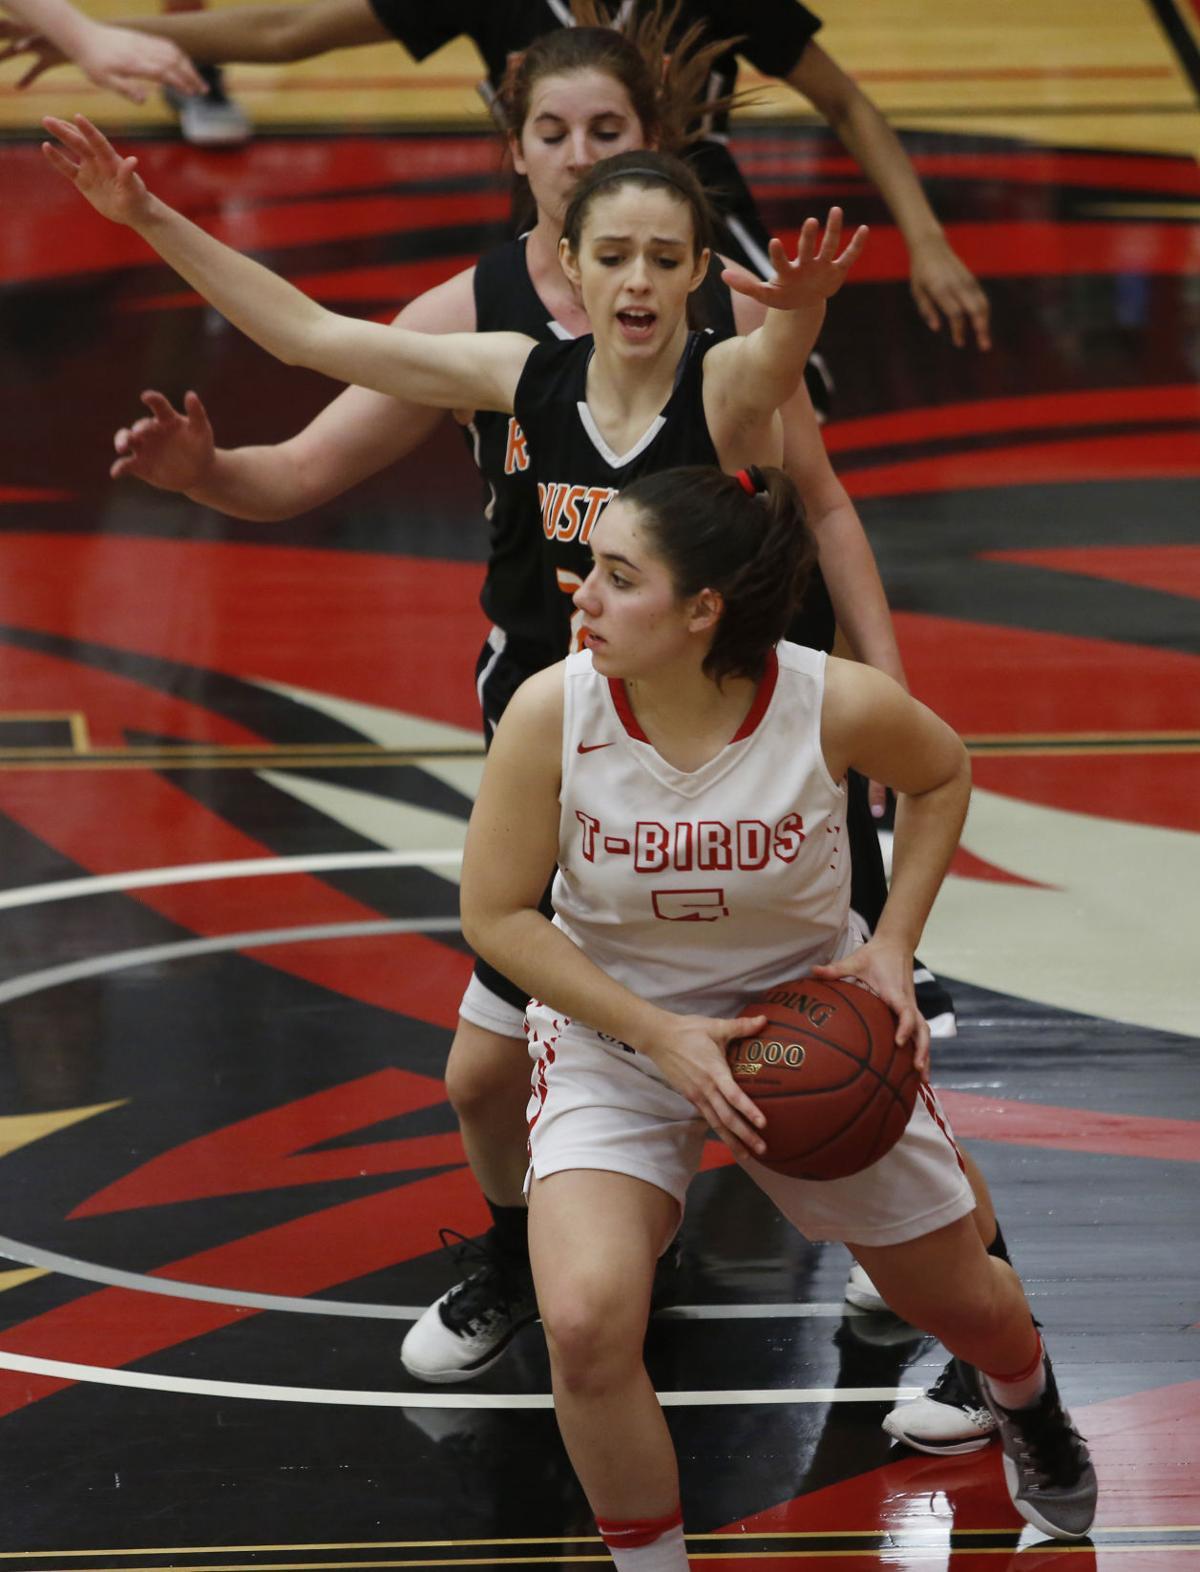 Casper College vs. CWC Women's Basketball - Artigues